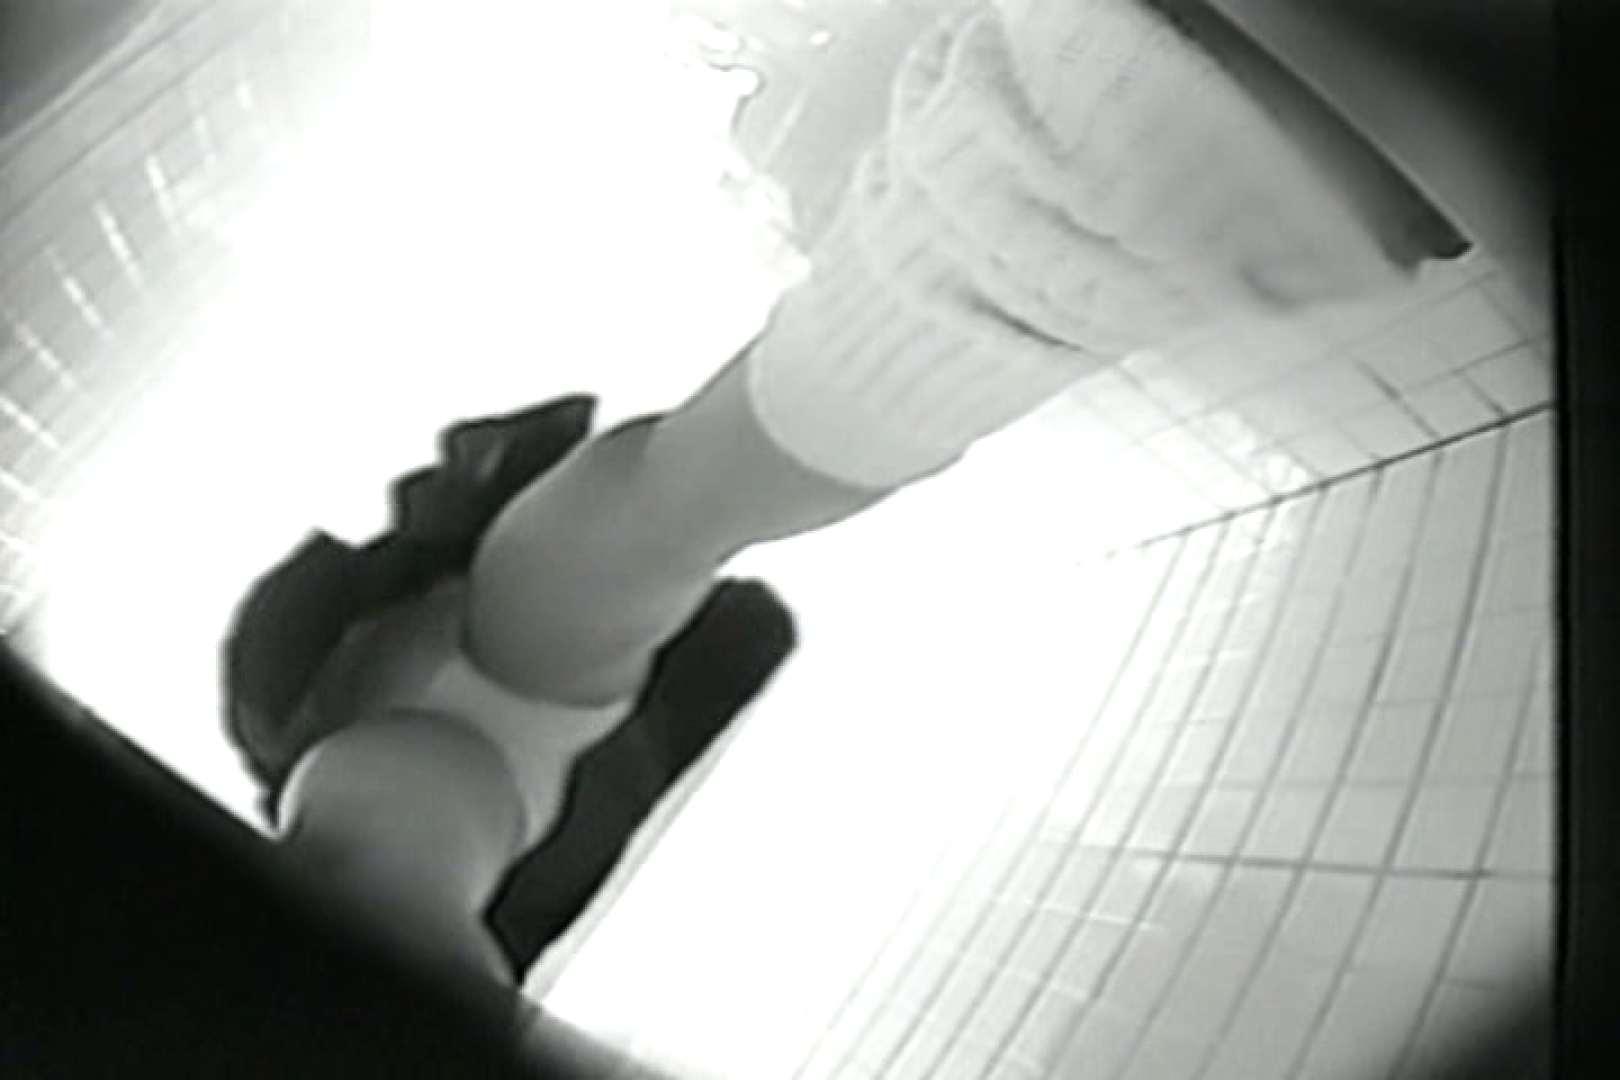 下半身シースルー洗面所Vol.3 0 | 0  20画像 6